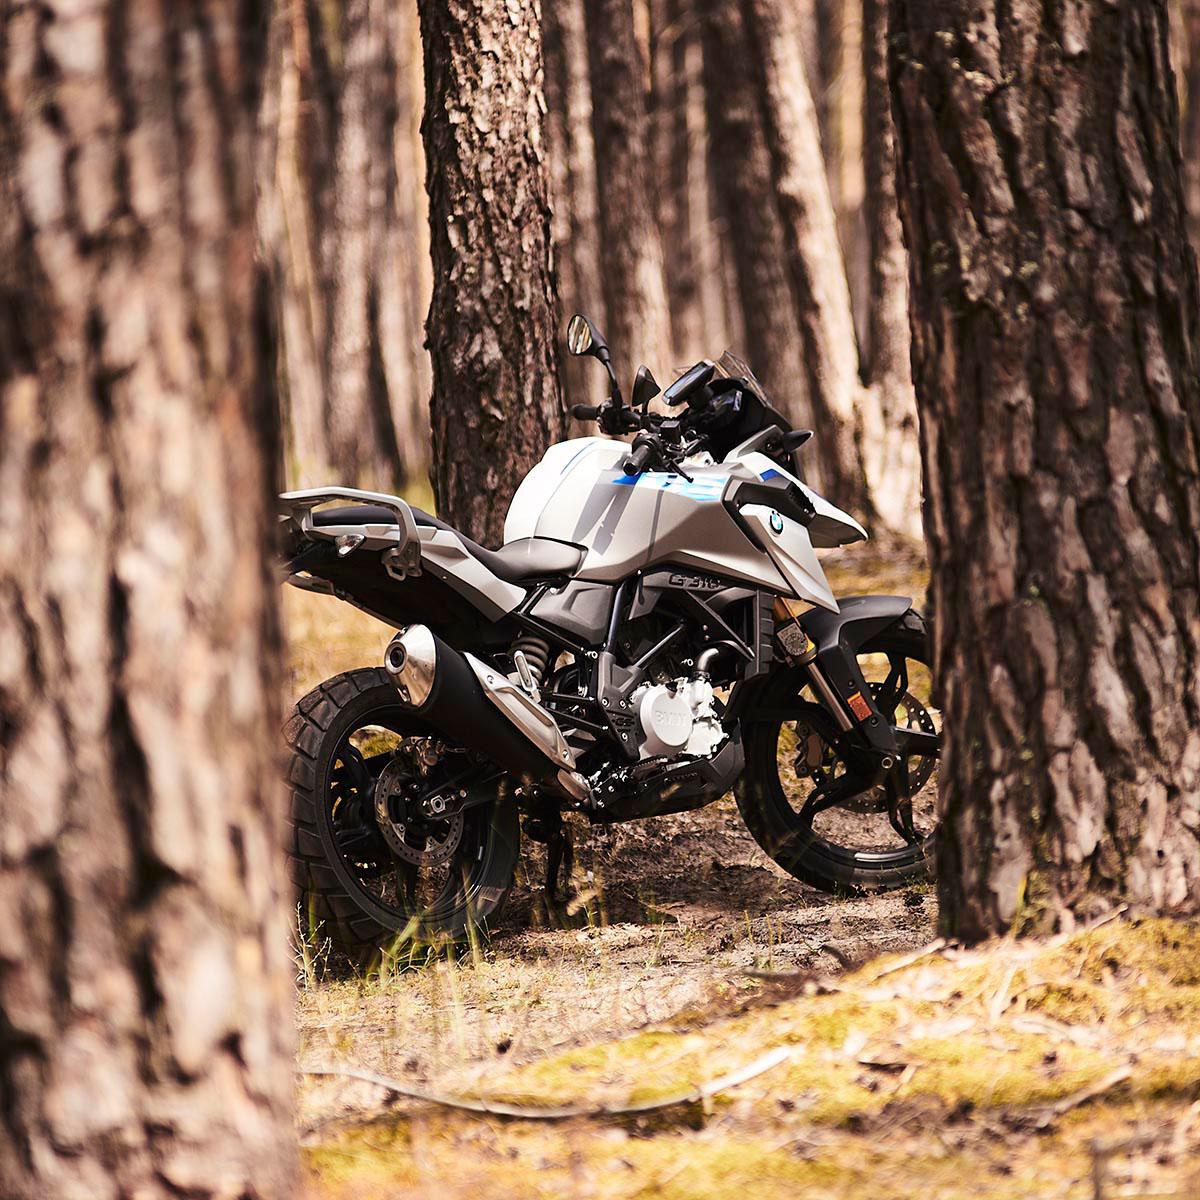 ©alschner-fotografie-motorräder-bike-motorcycle-picture-aktion-05.jpg